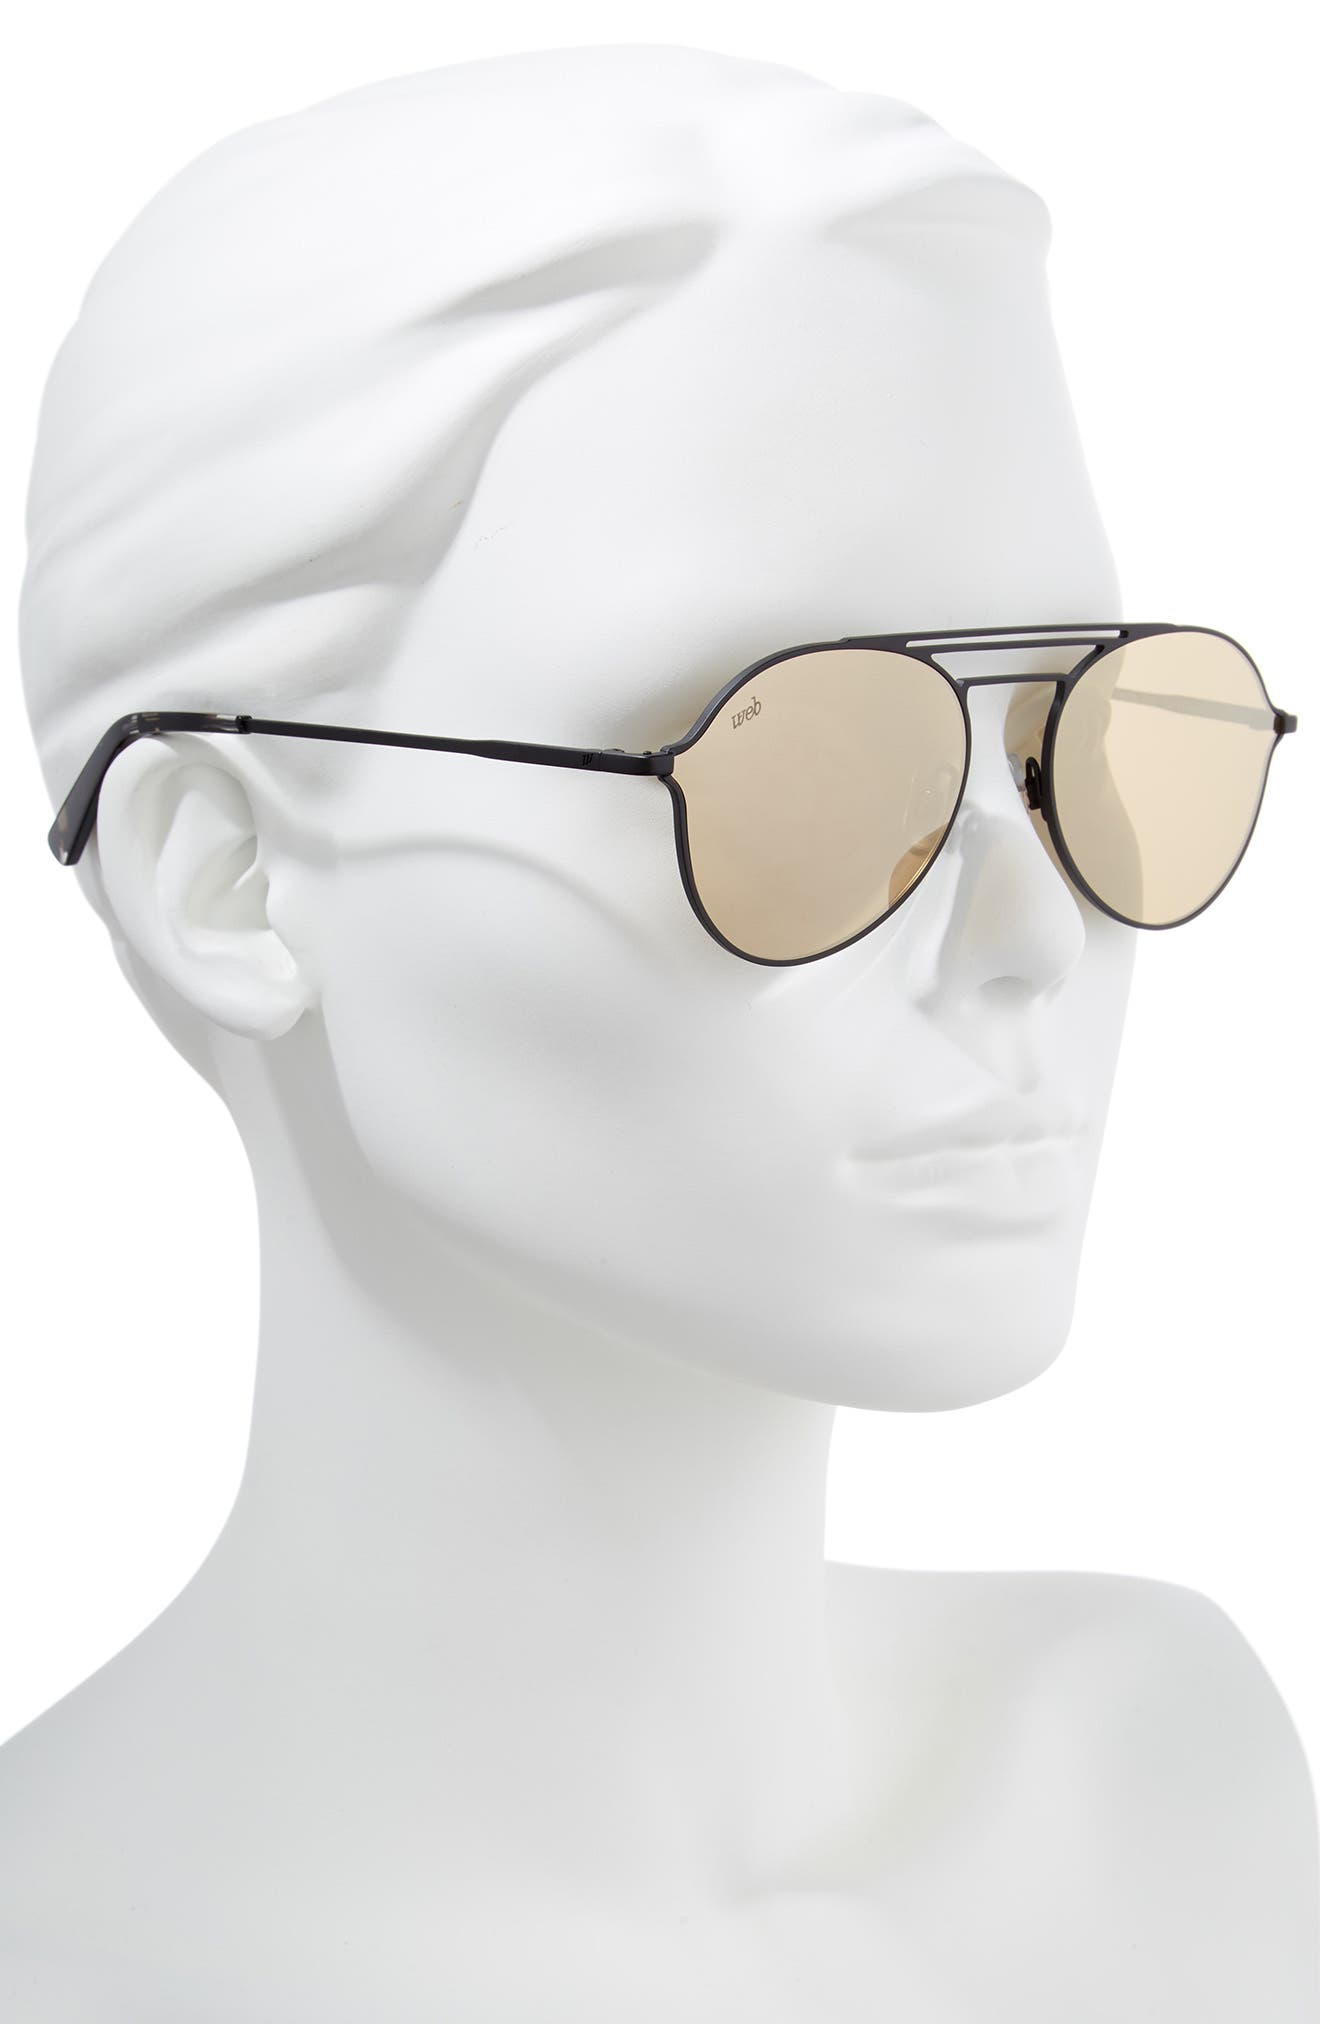 56mm Aviator Sunglasses,                             Alternate thumbnail 2, color,                             MATTE BLACK/ BROWN MIRROR